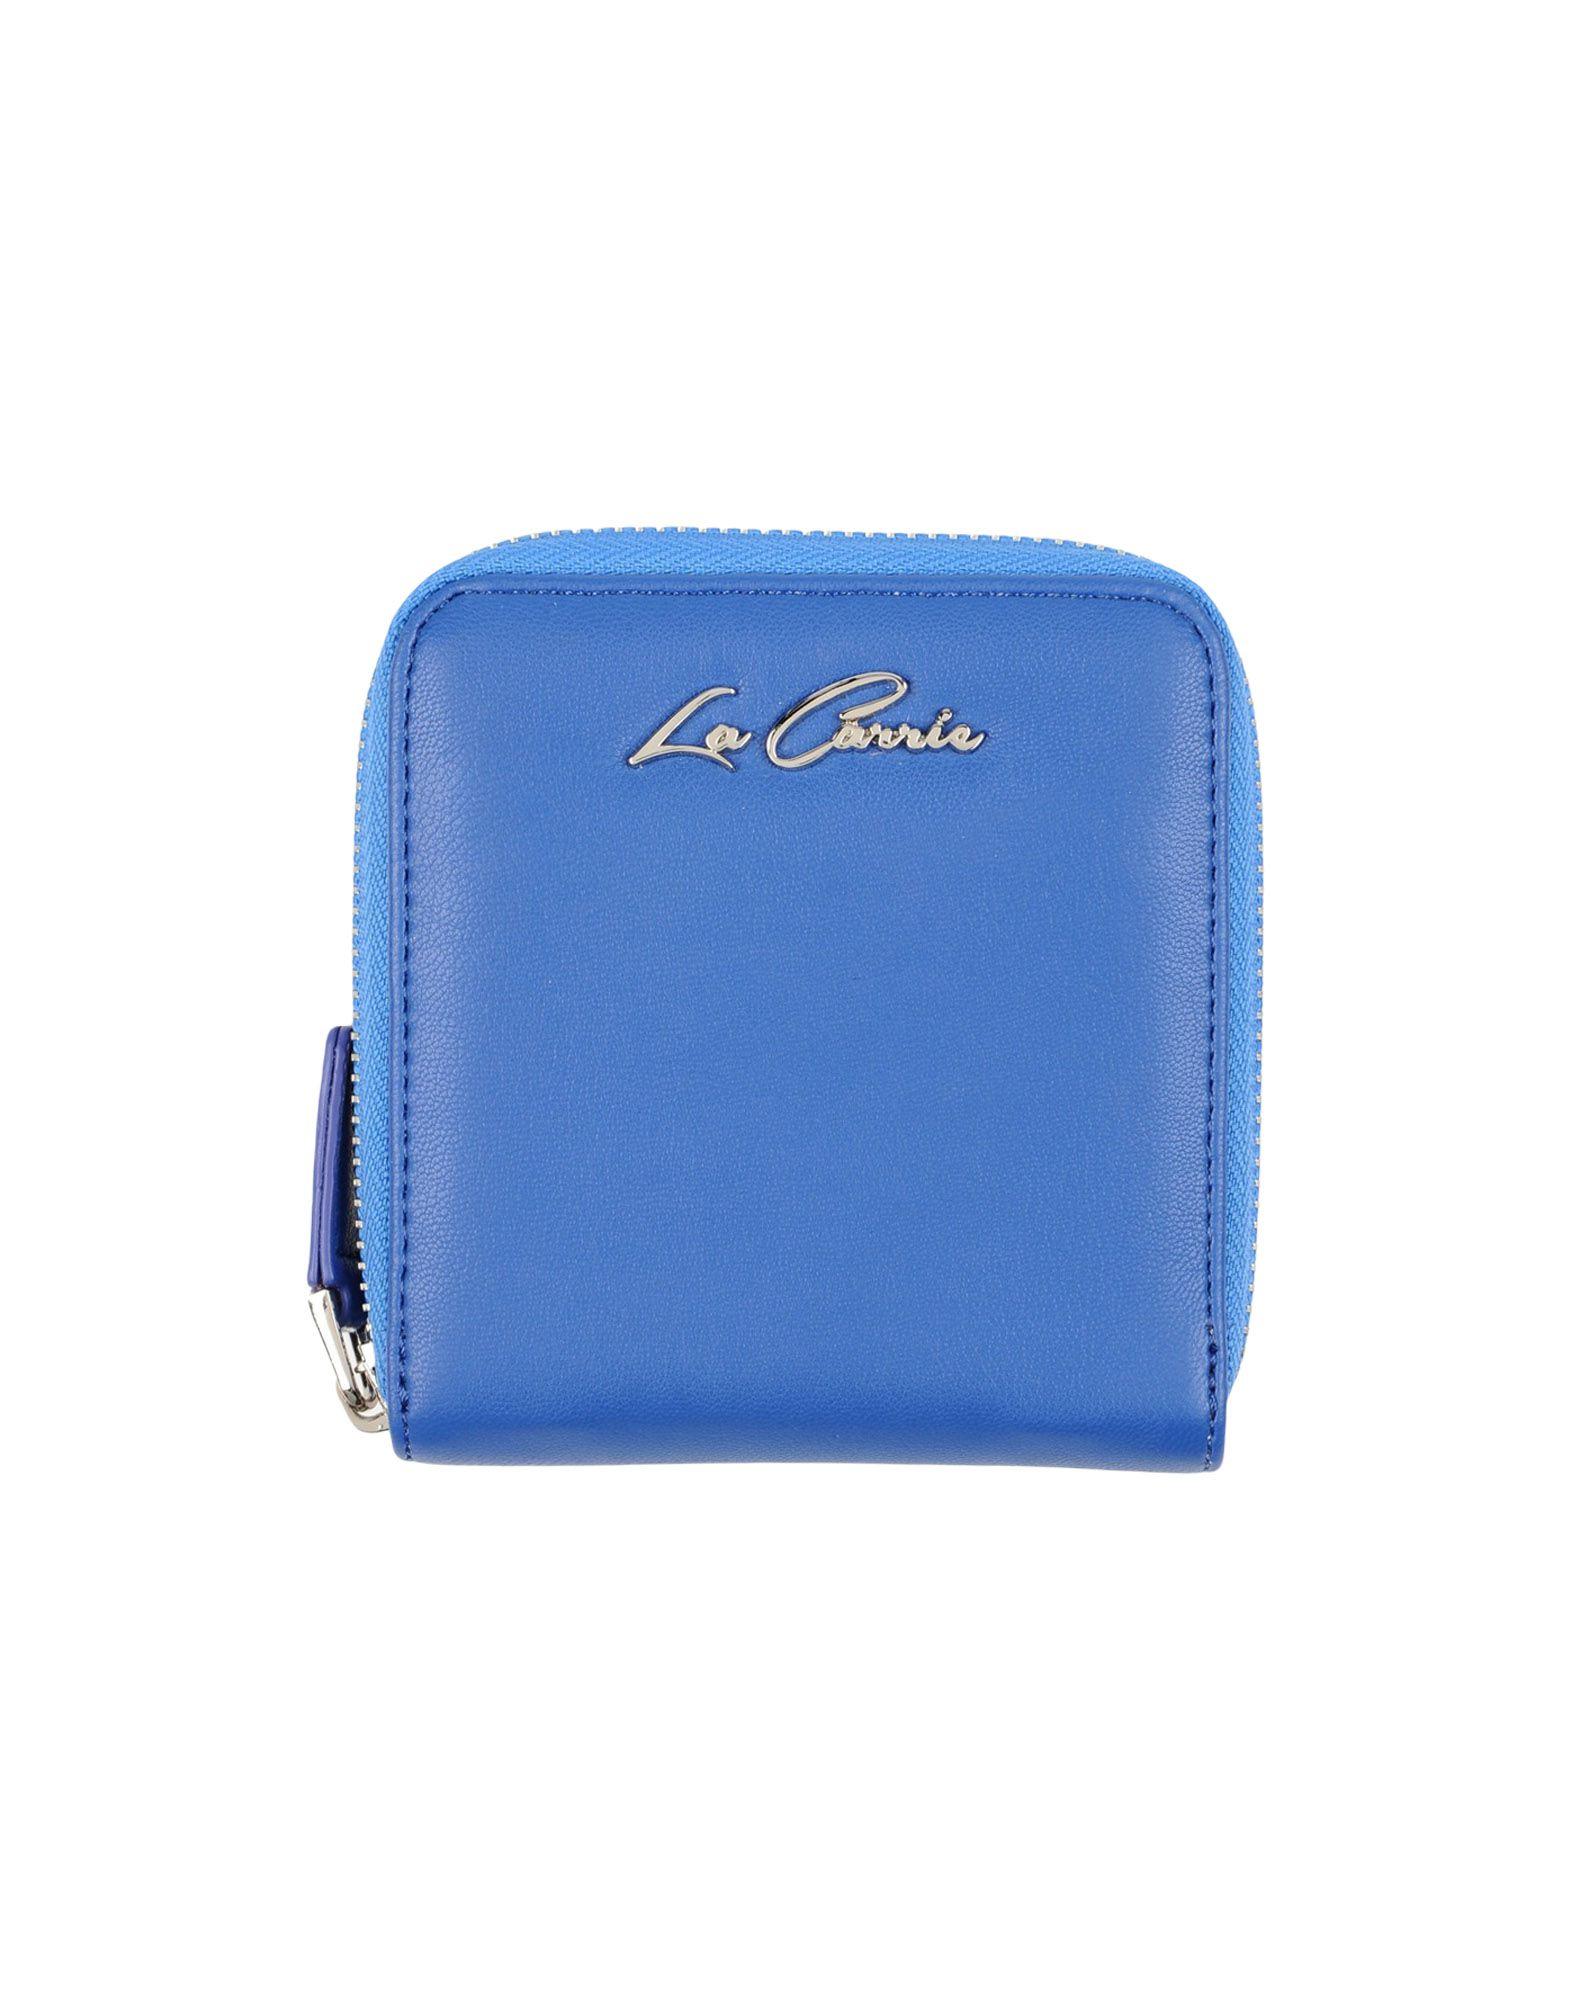 LA CARRIE BAG Damen Brieftasche Farbe Blau Größe 1